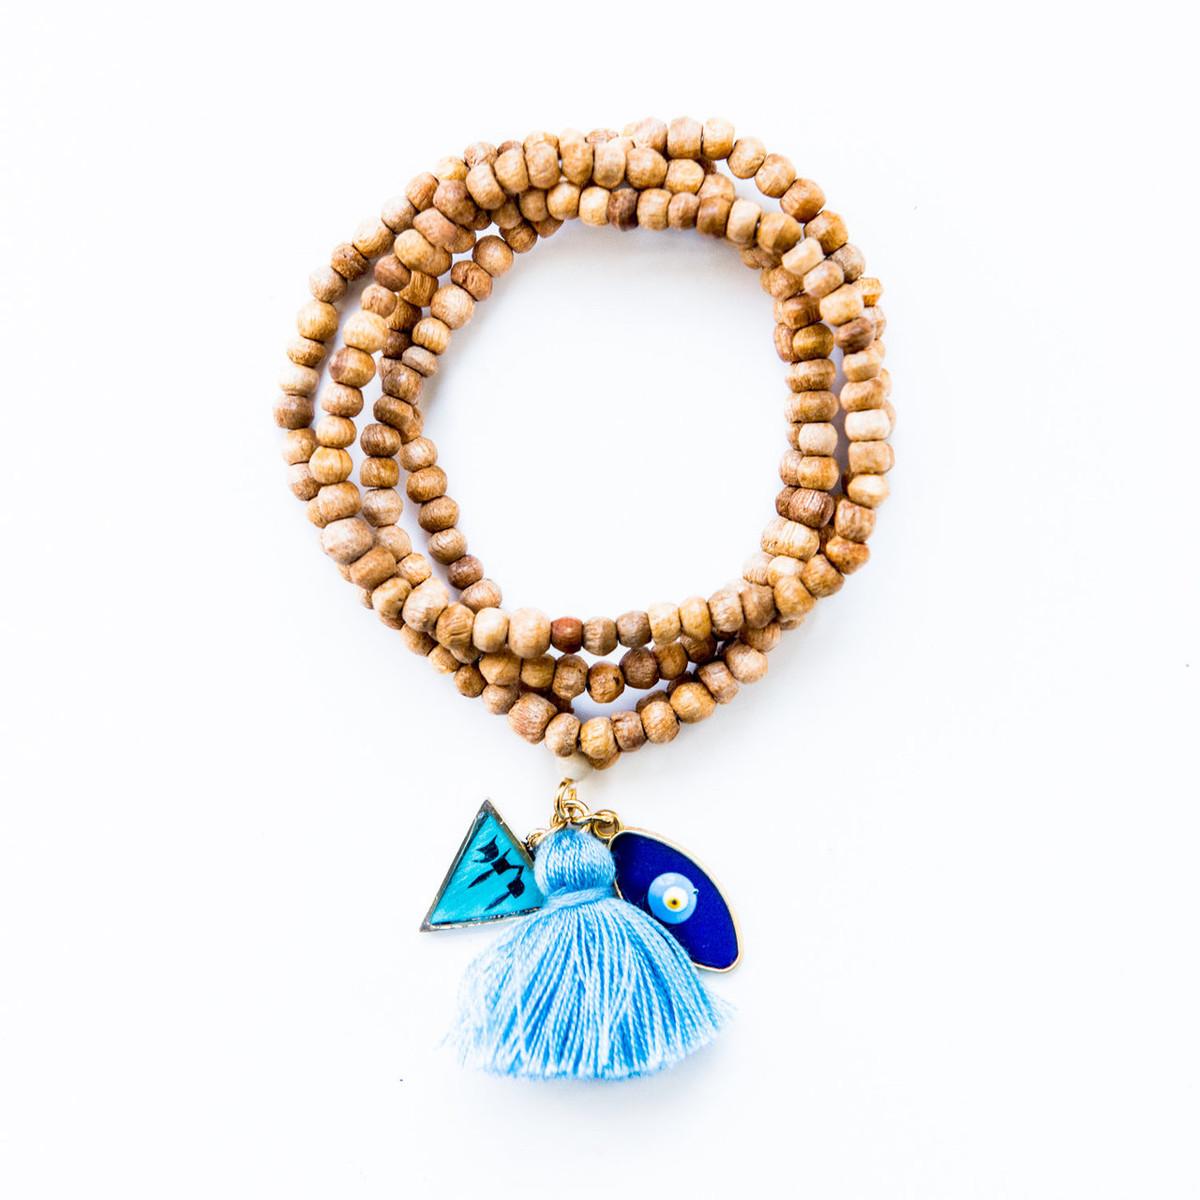 7Stitches Kabbalah Bracelet/Necklace in Tan Wood